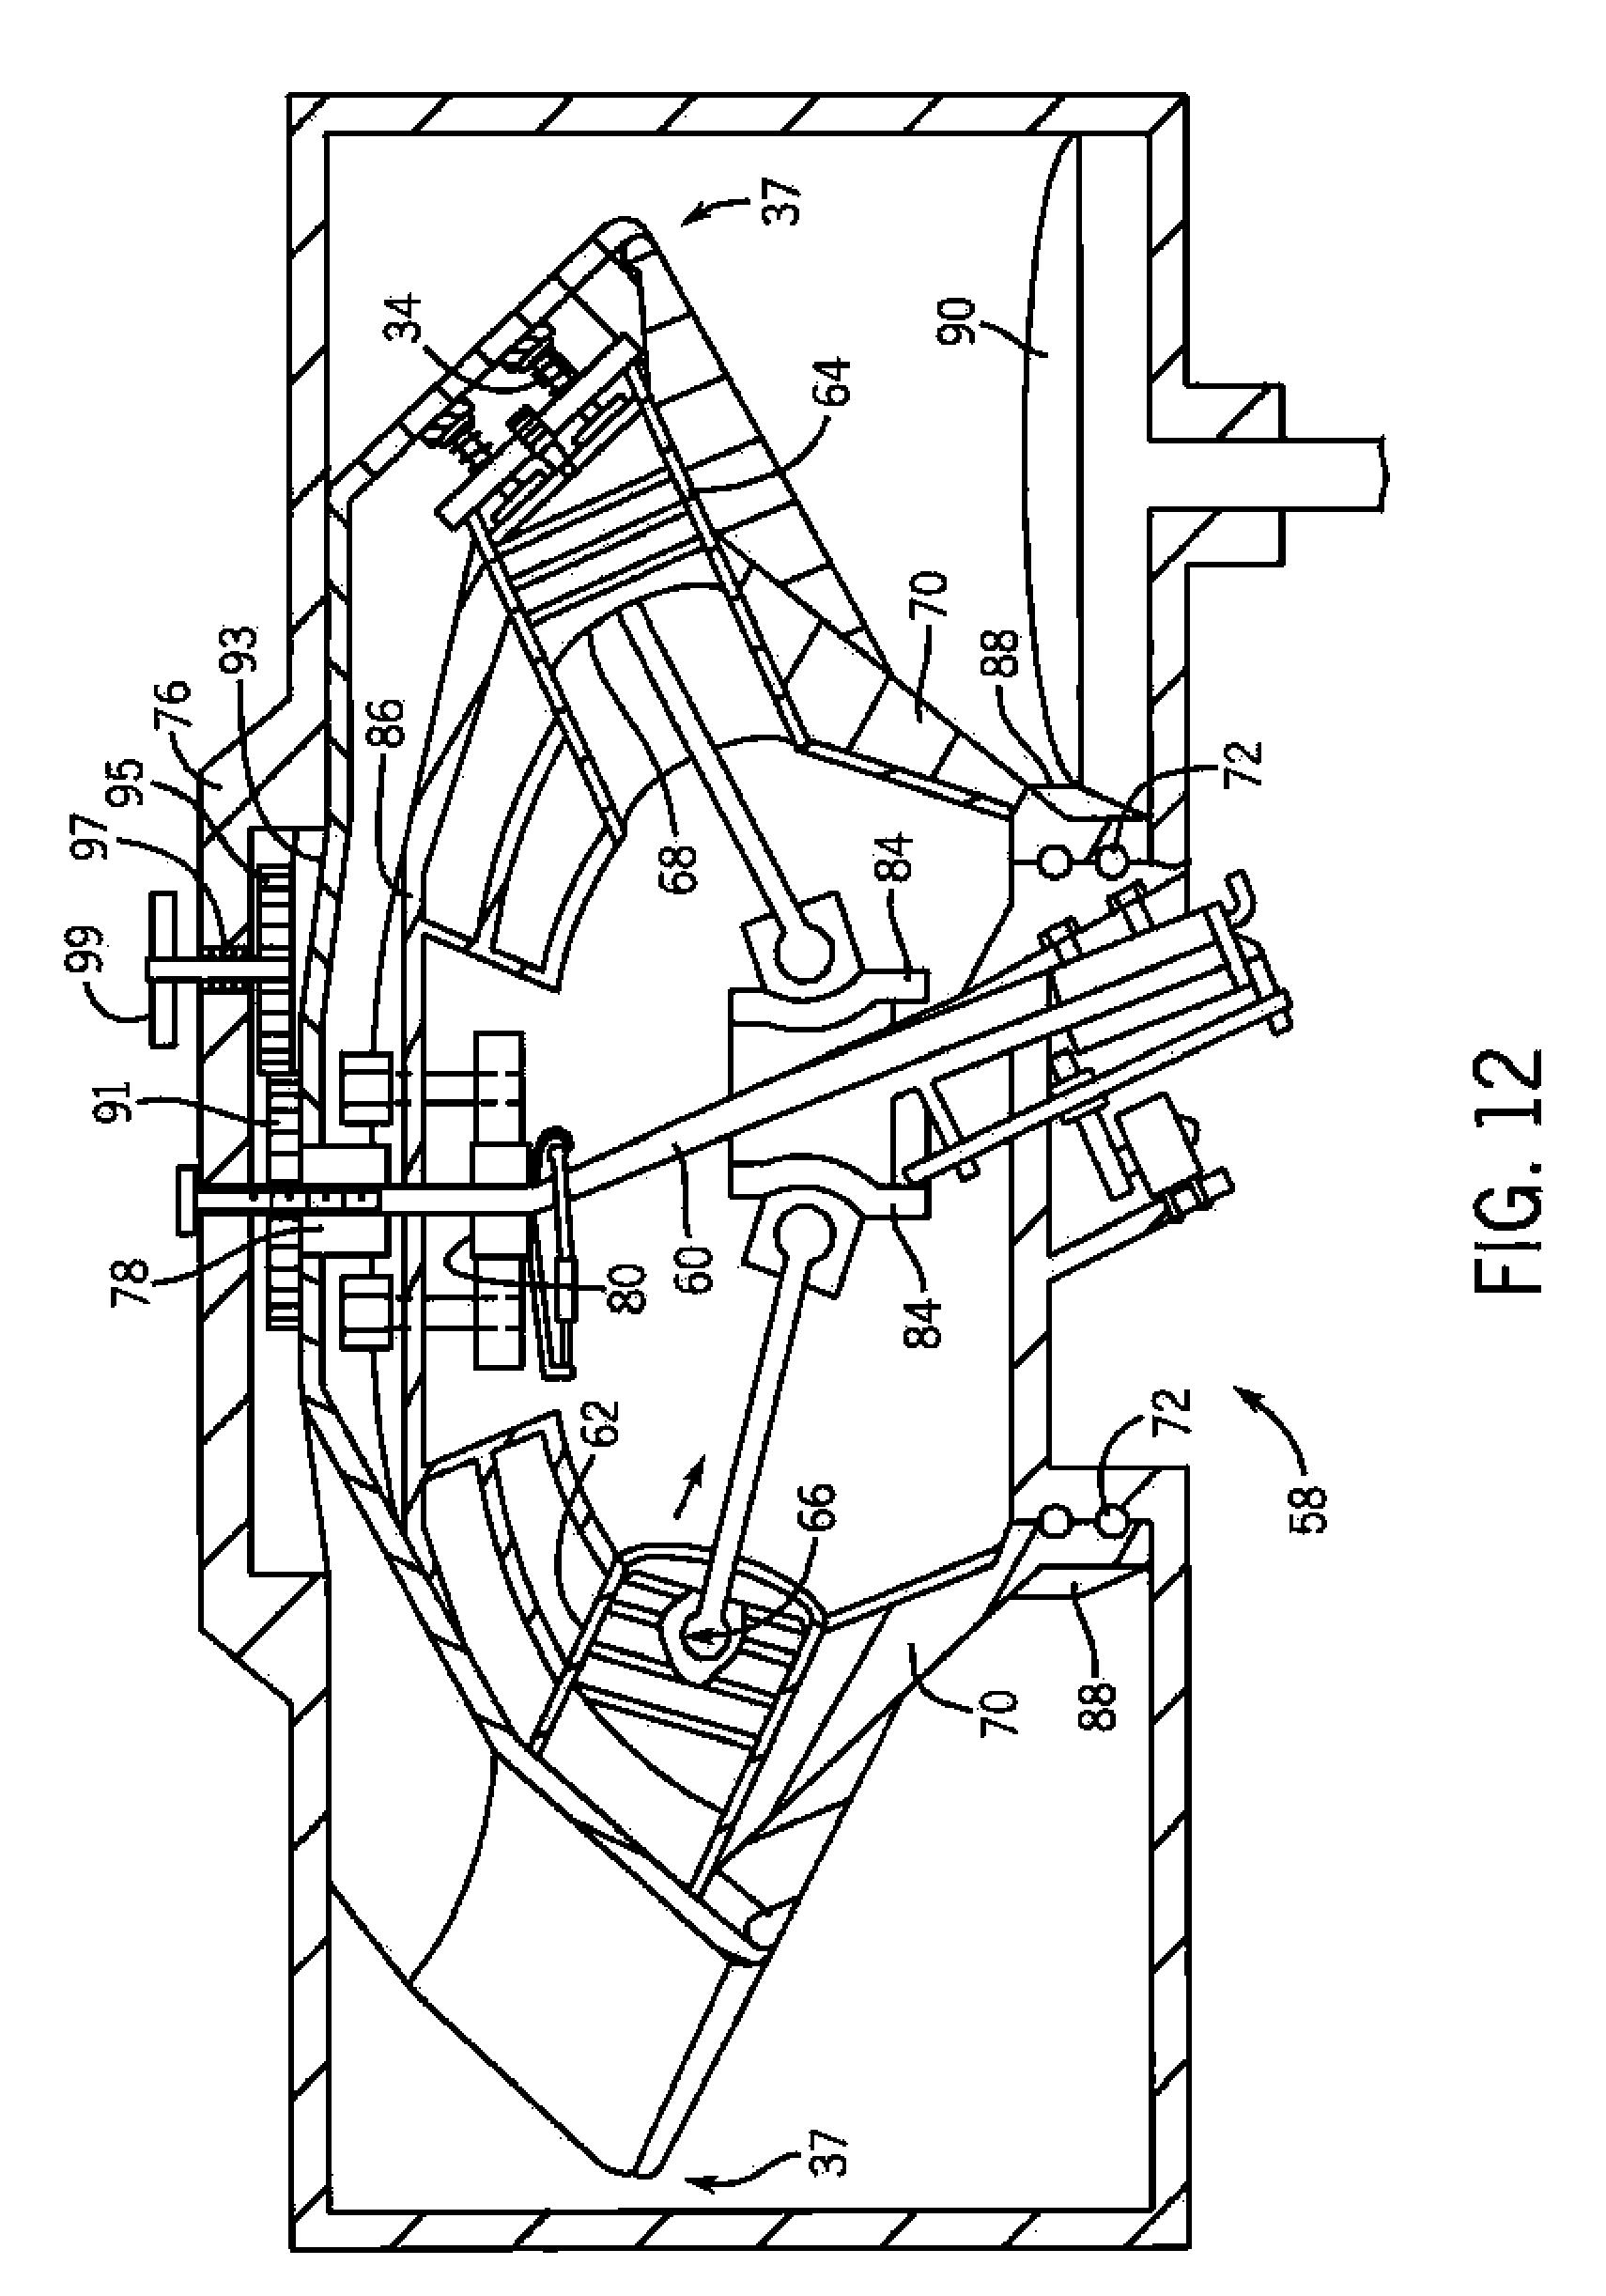 Homemade Jet Engine Diagram Dispment Berrings. Parts. Auto